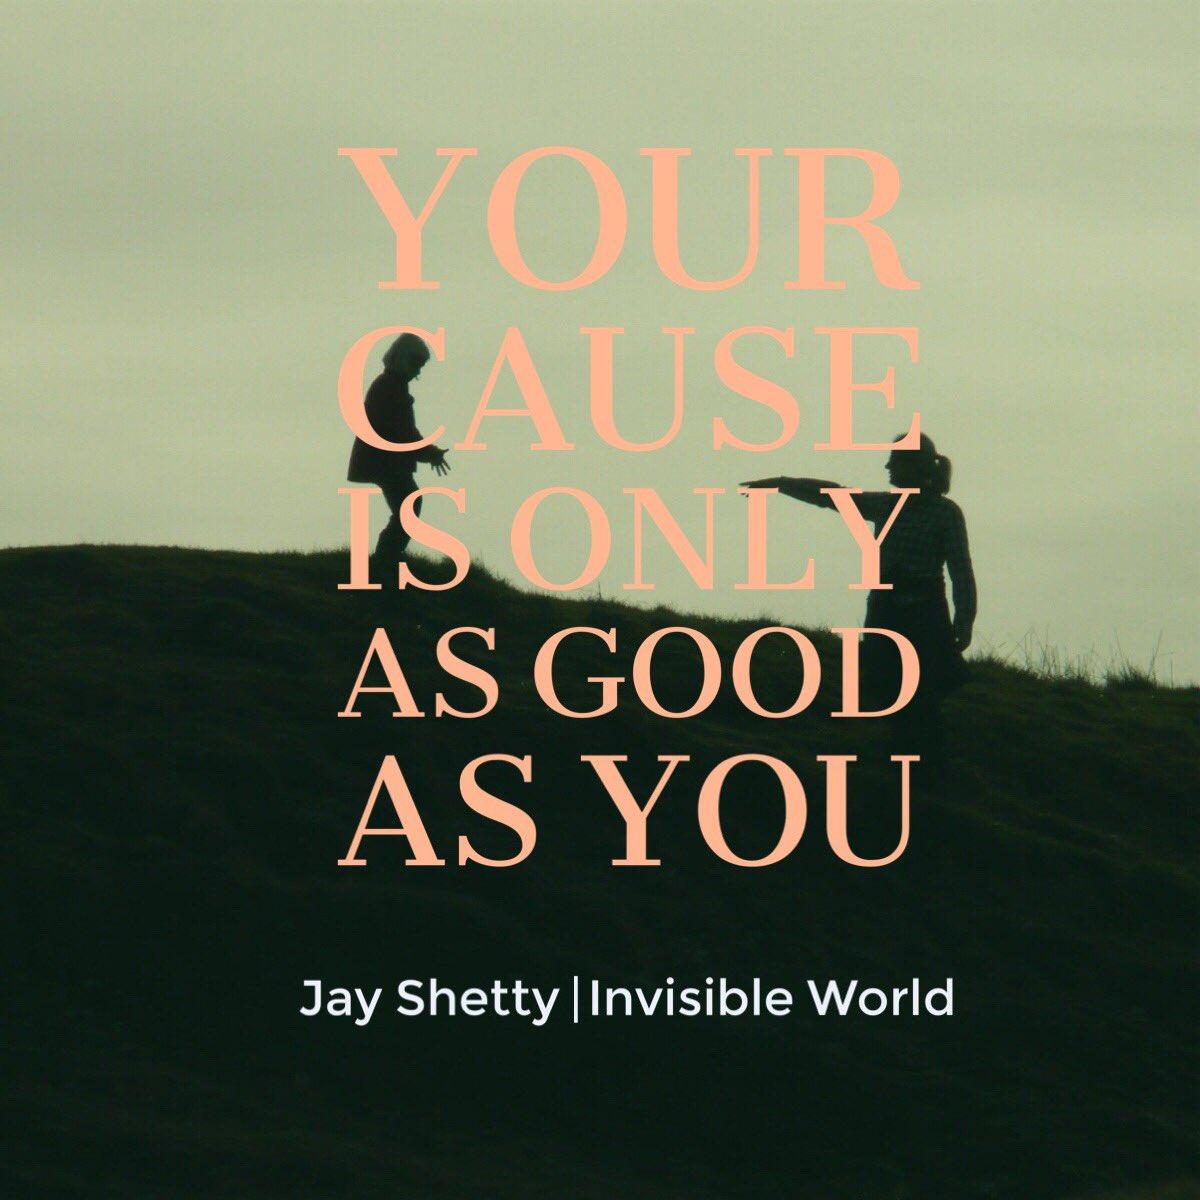 Jay Shetty on Twitter: